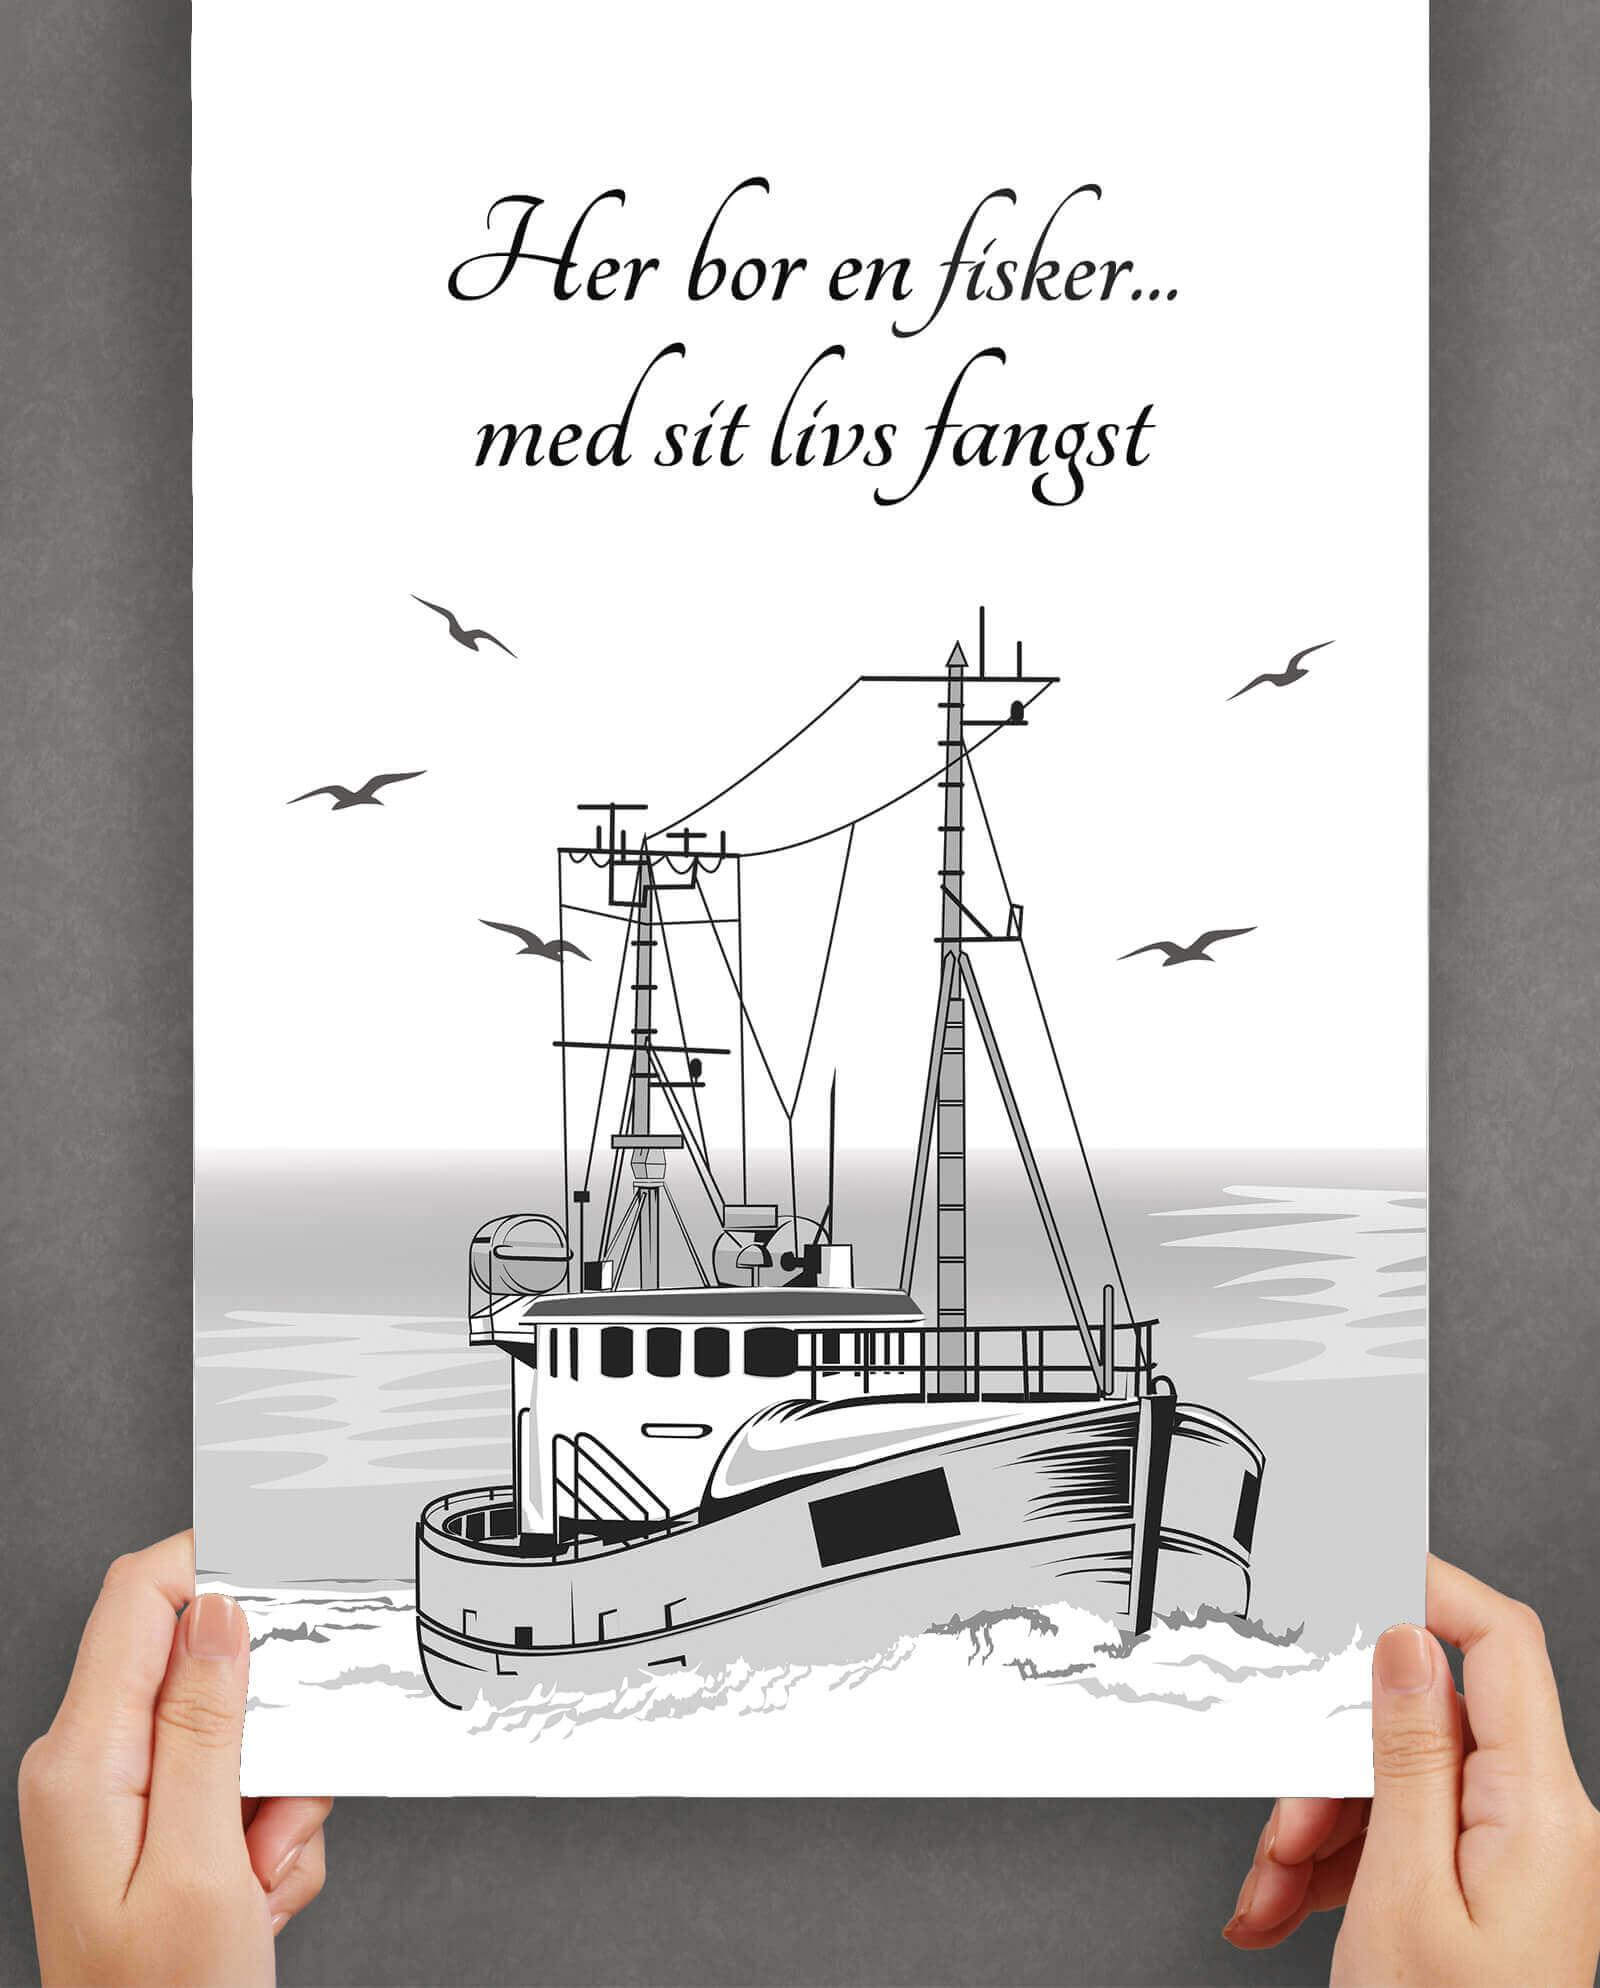 fisker-job-plakat-1